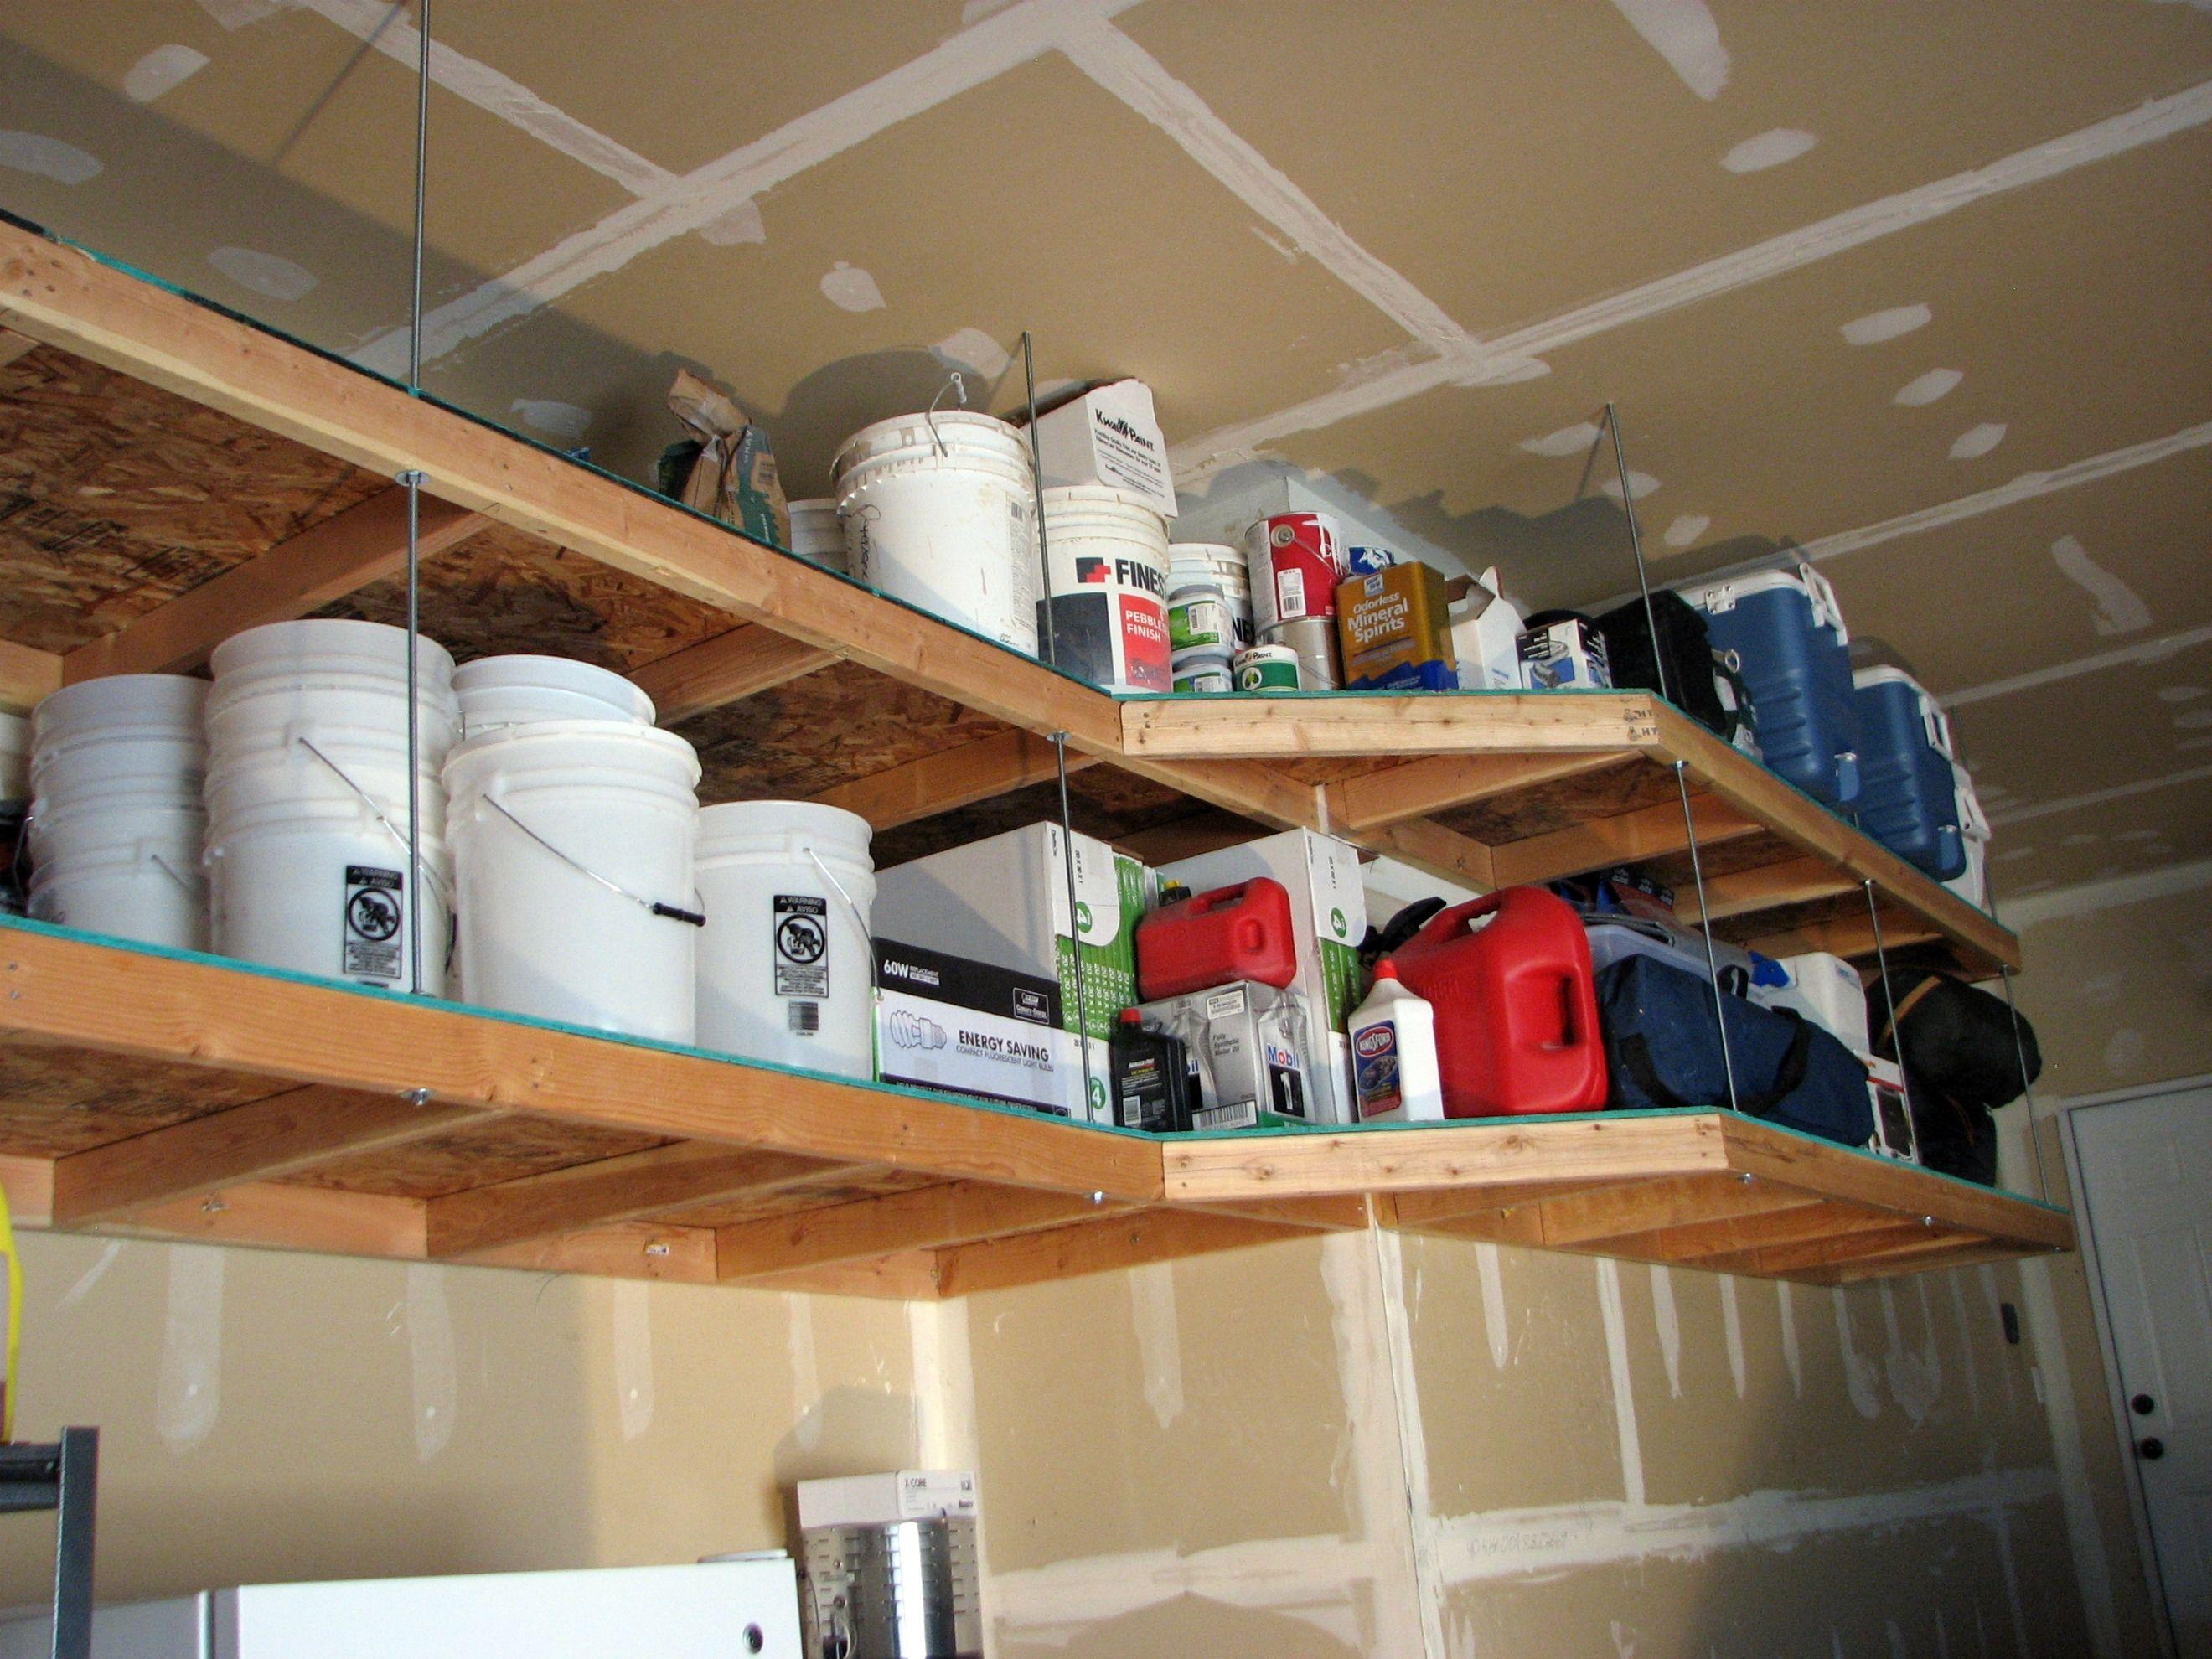 1000  images about Ceiling Overhead Storage Ideas on Pinterest   Bike  storage  Storage ideas. ceiling mounted garage storage   Furniture Market